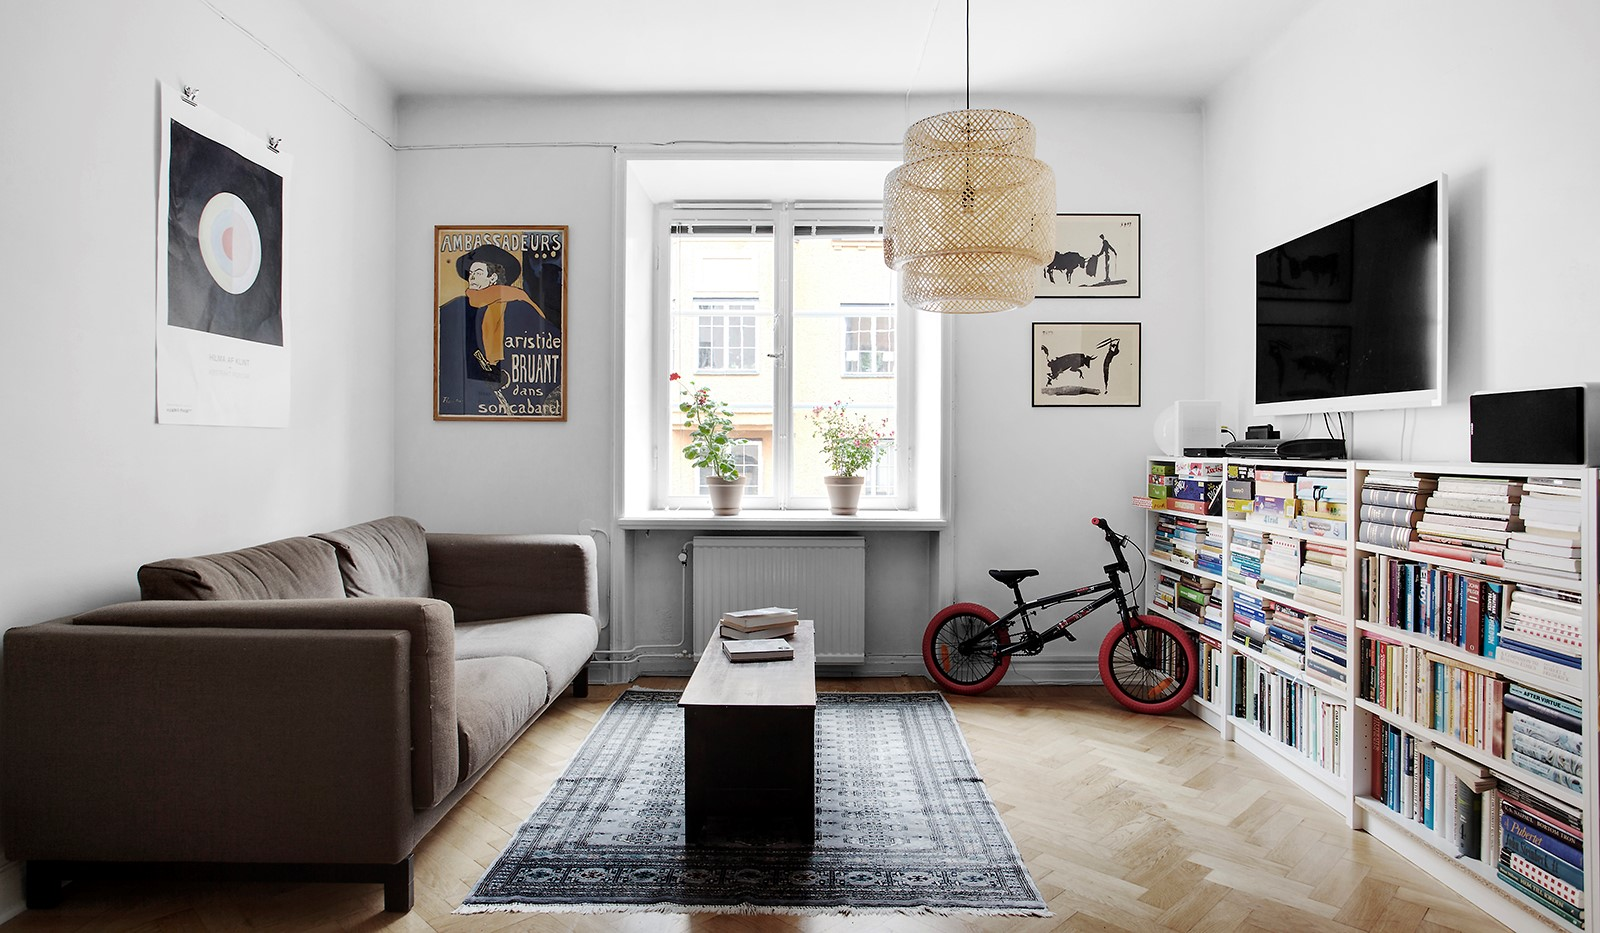 Heleneborgsgatan 30 - Vardagsrum